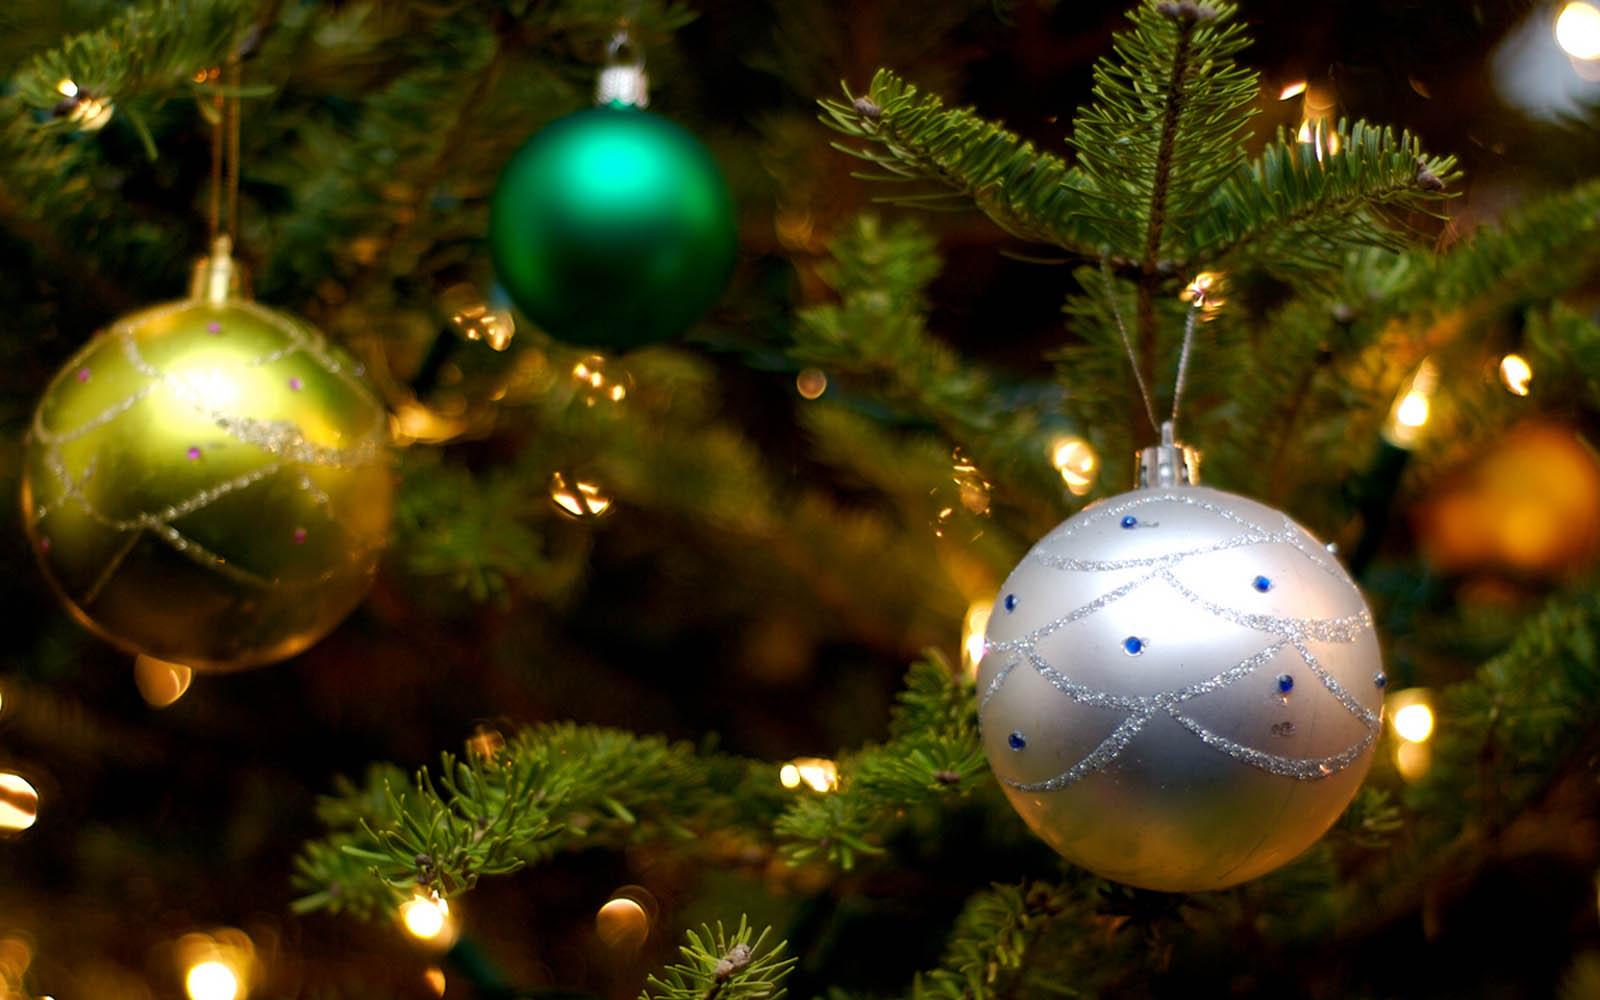 christmas balls background - photo #3